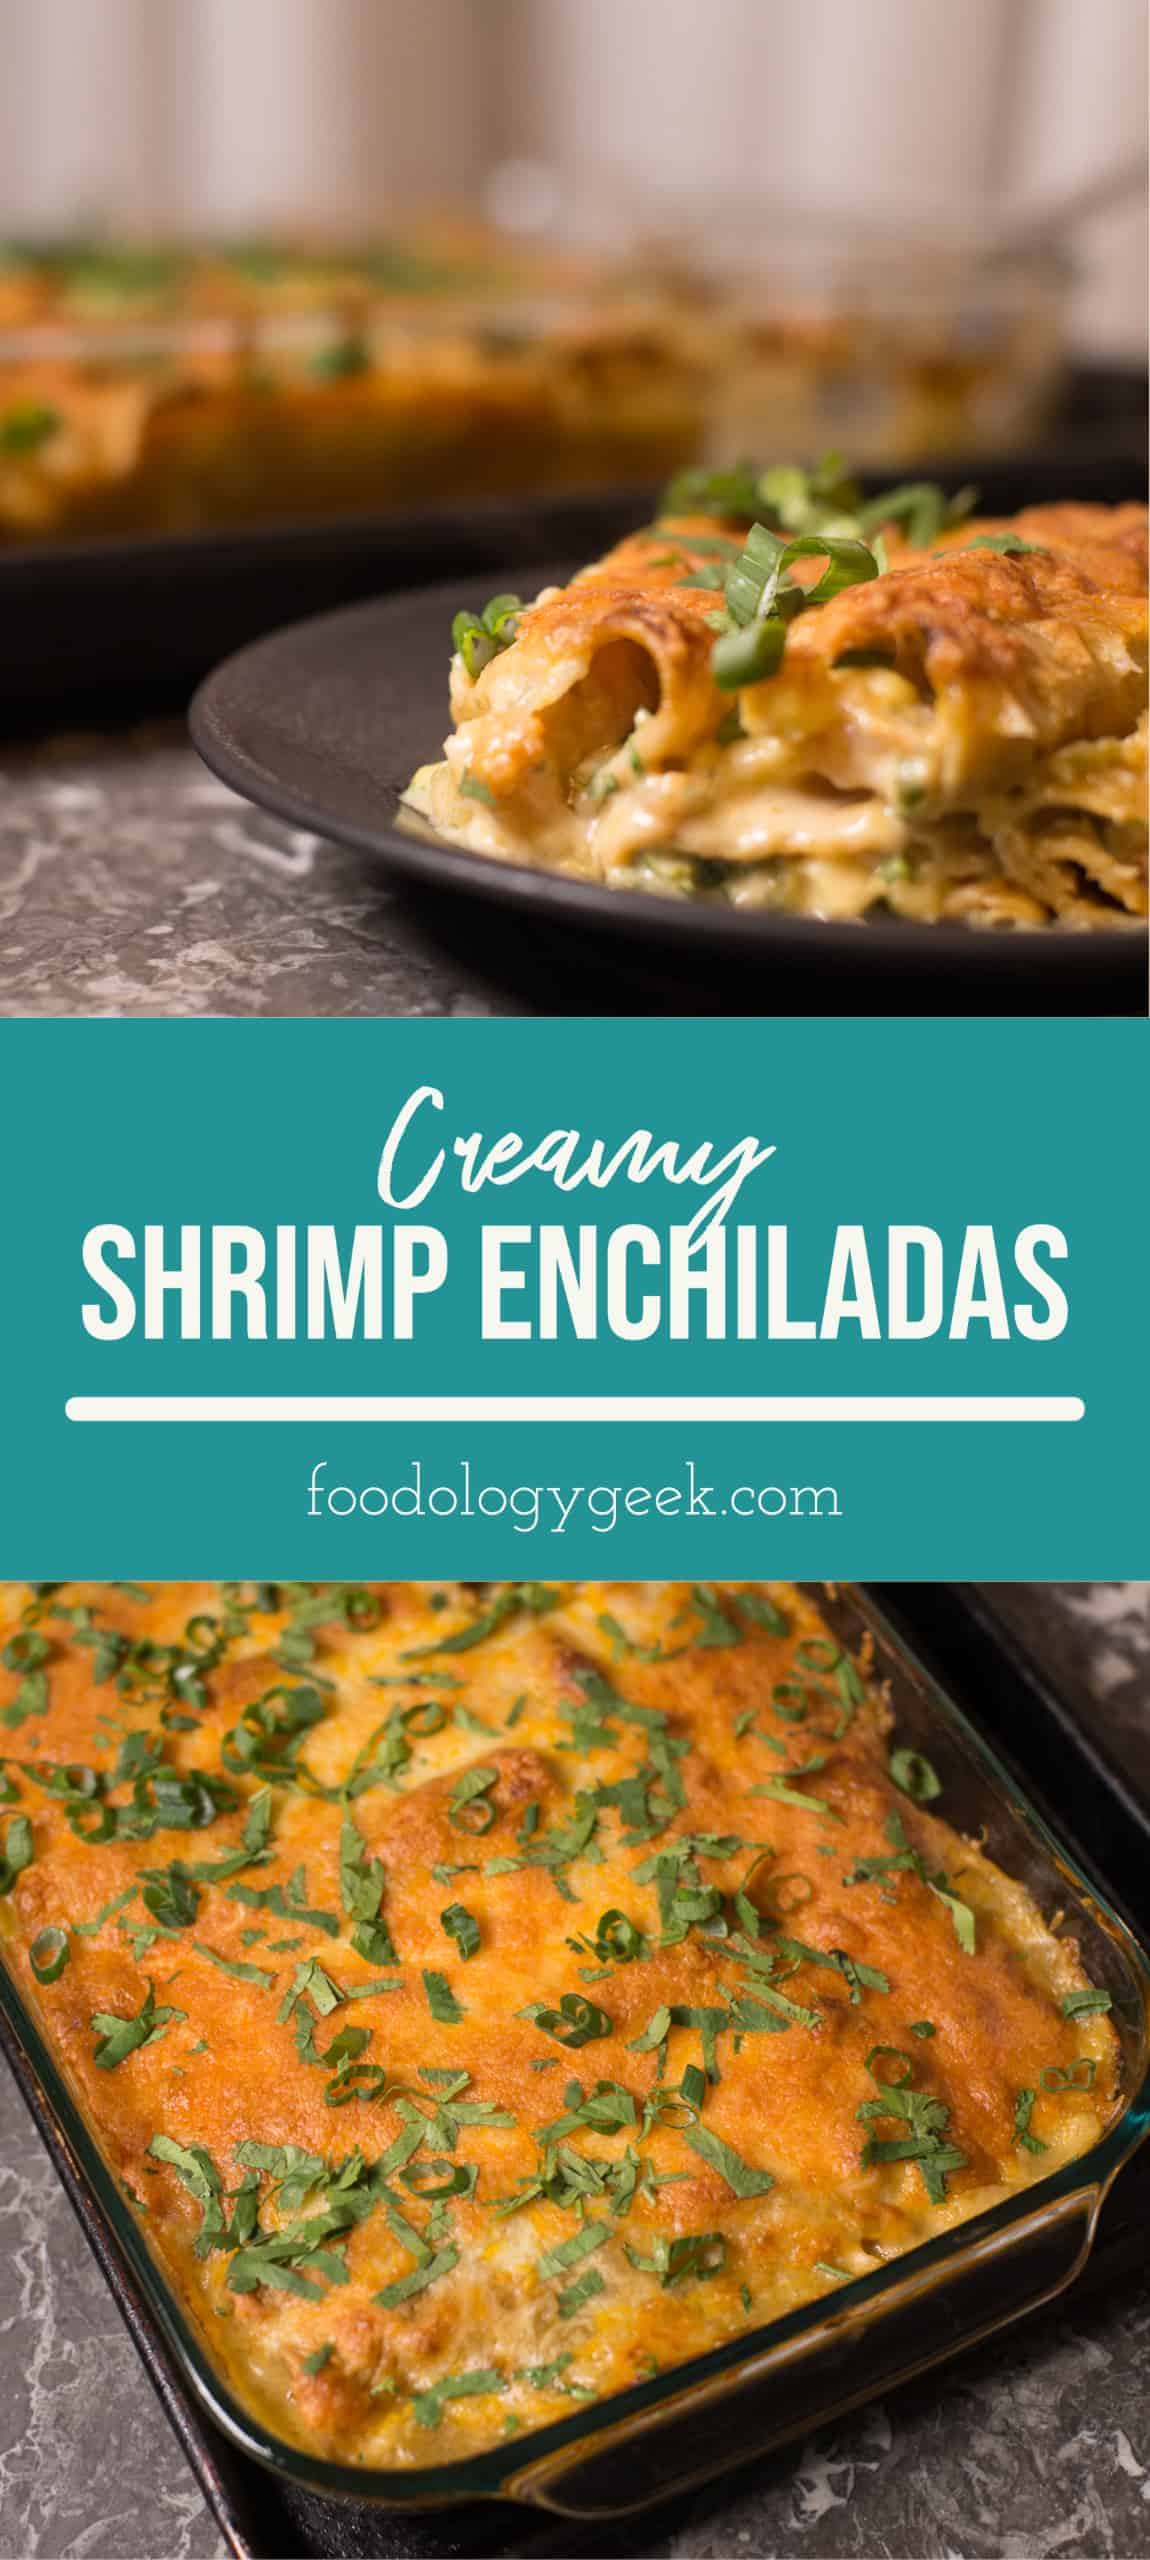 creamy shrimp enchiladas pinterest image by foodology geek